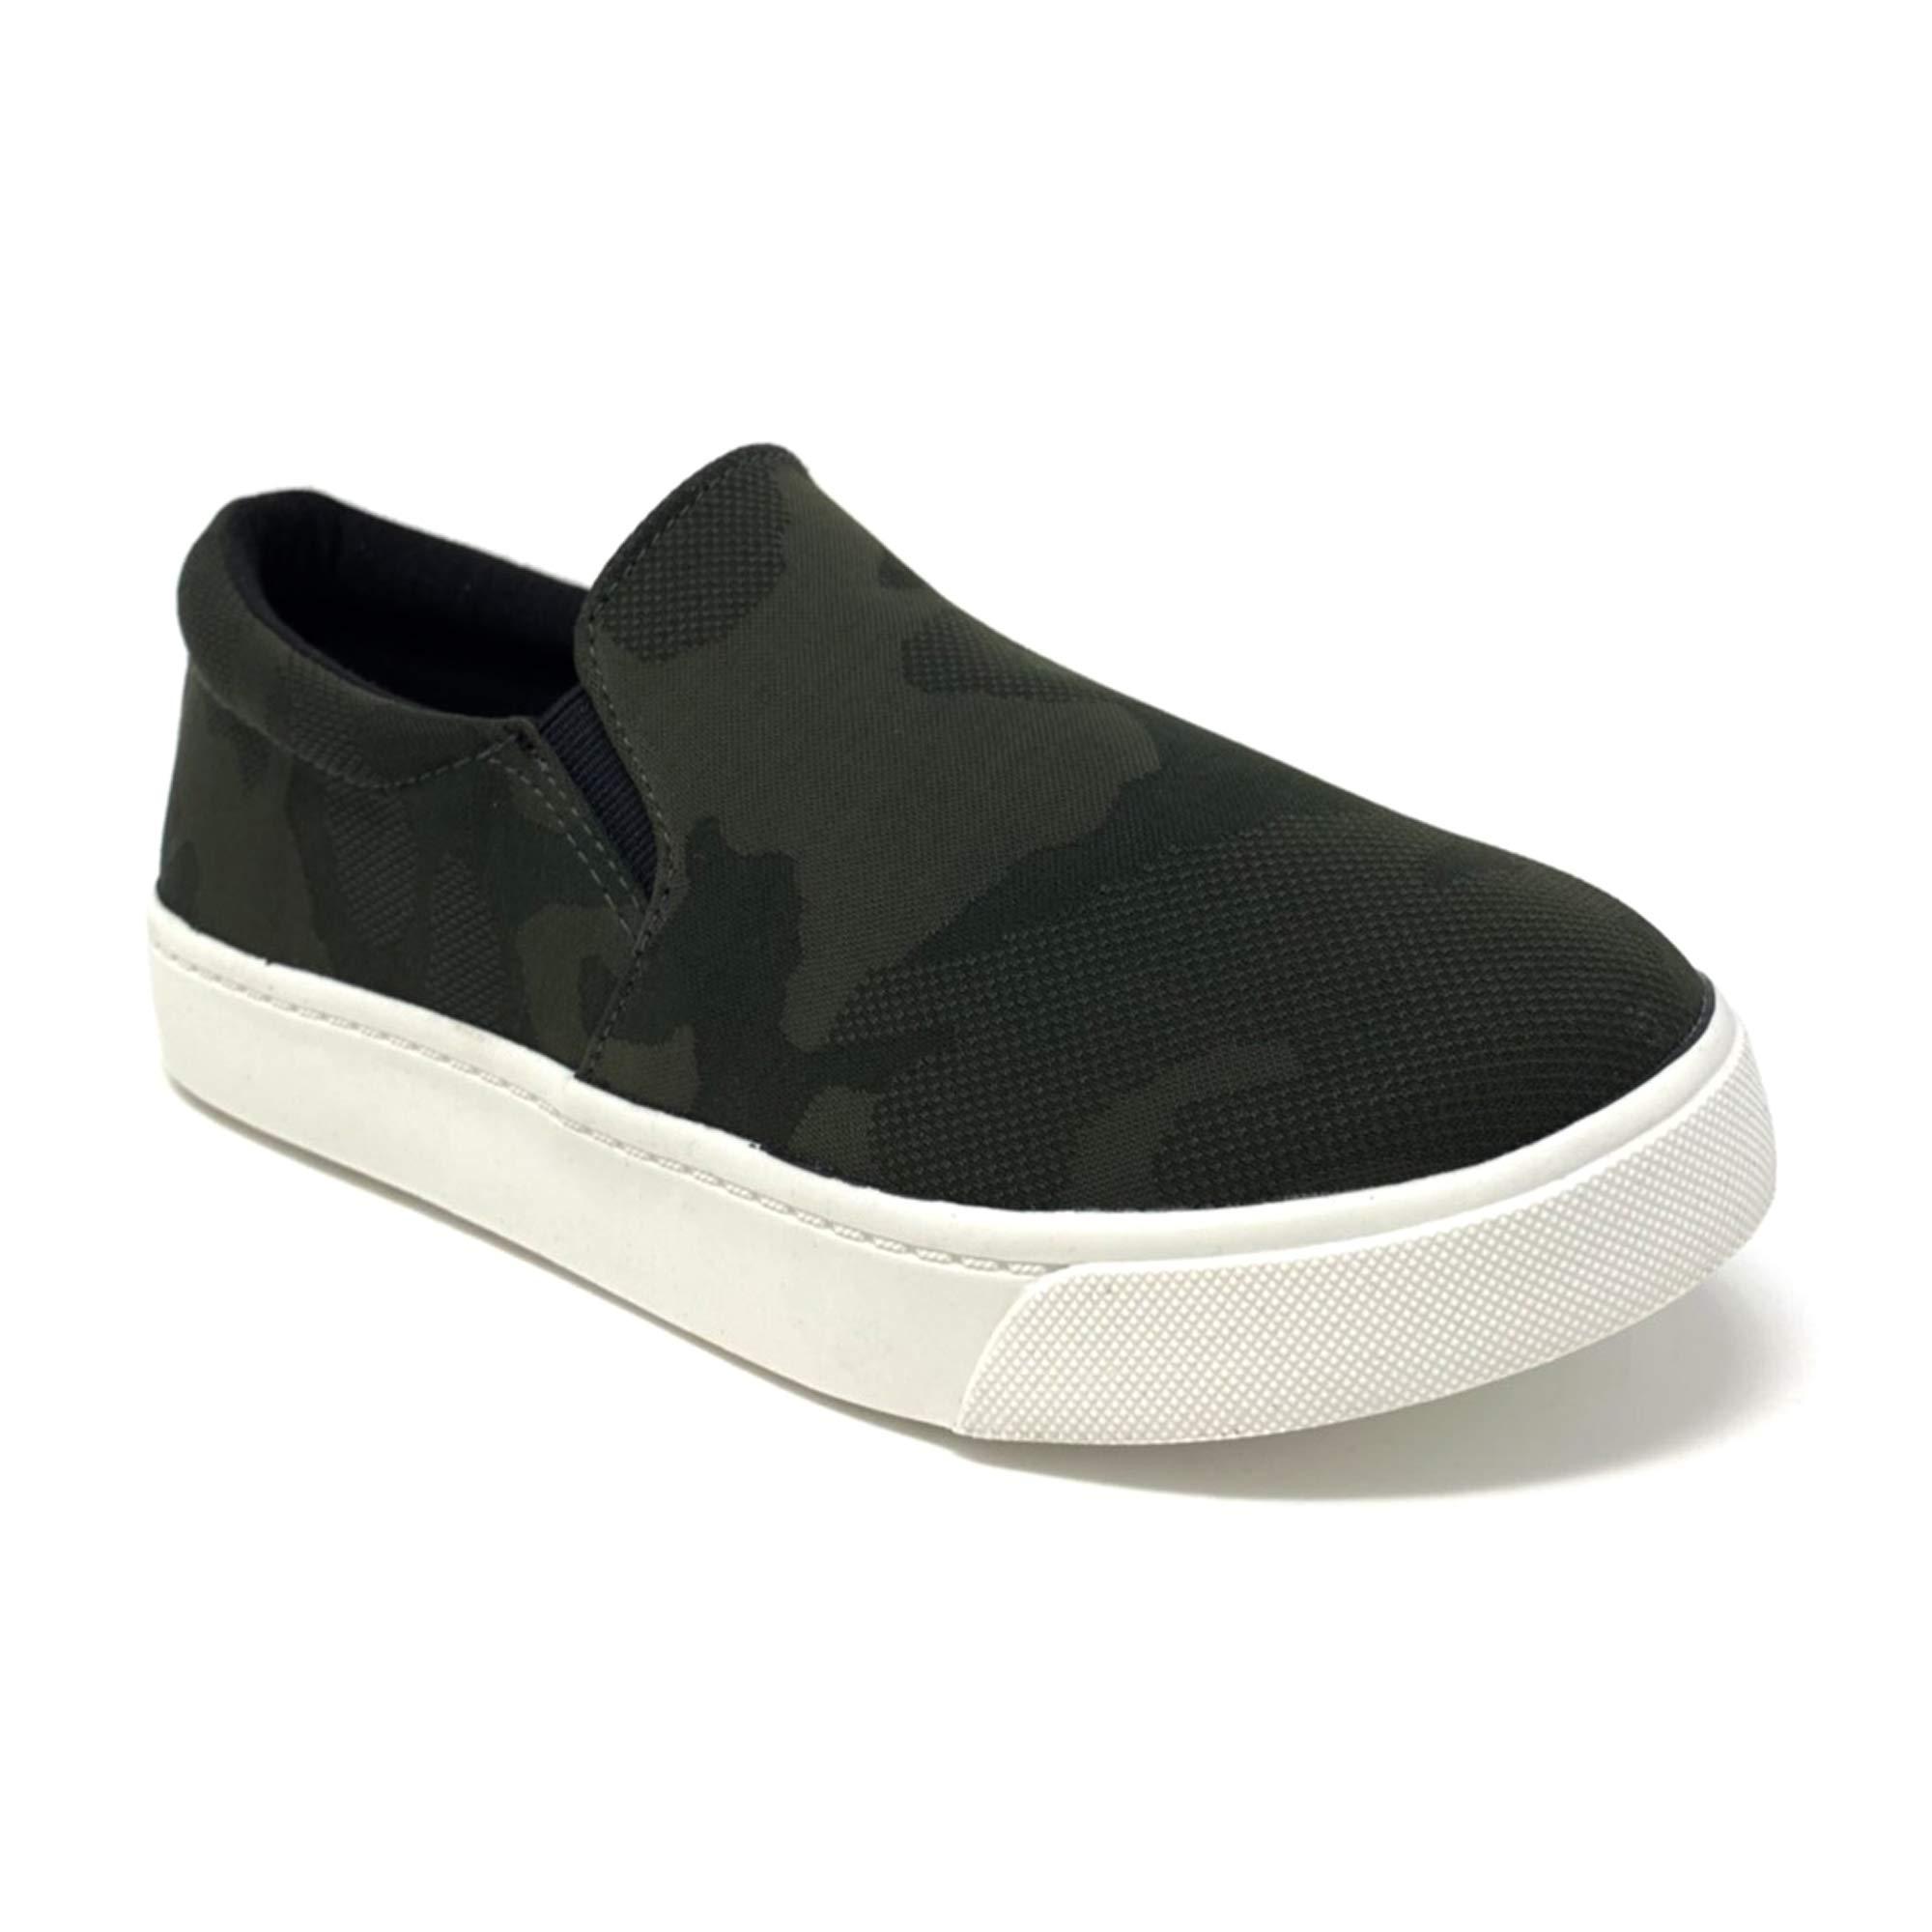 SODA Shoes Women's Tracer Slip On White Sole Shoes (8 M US, D-KHAr)